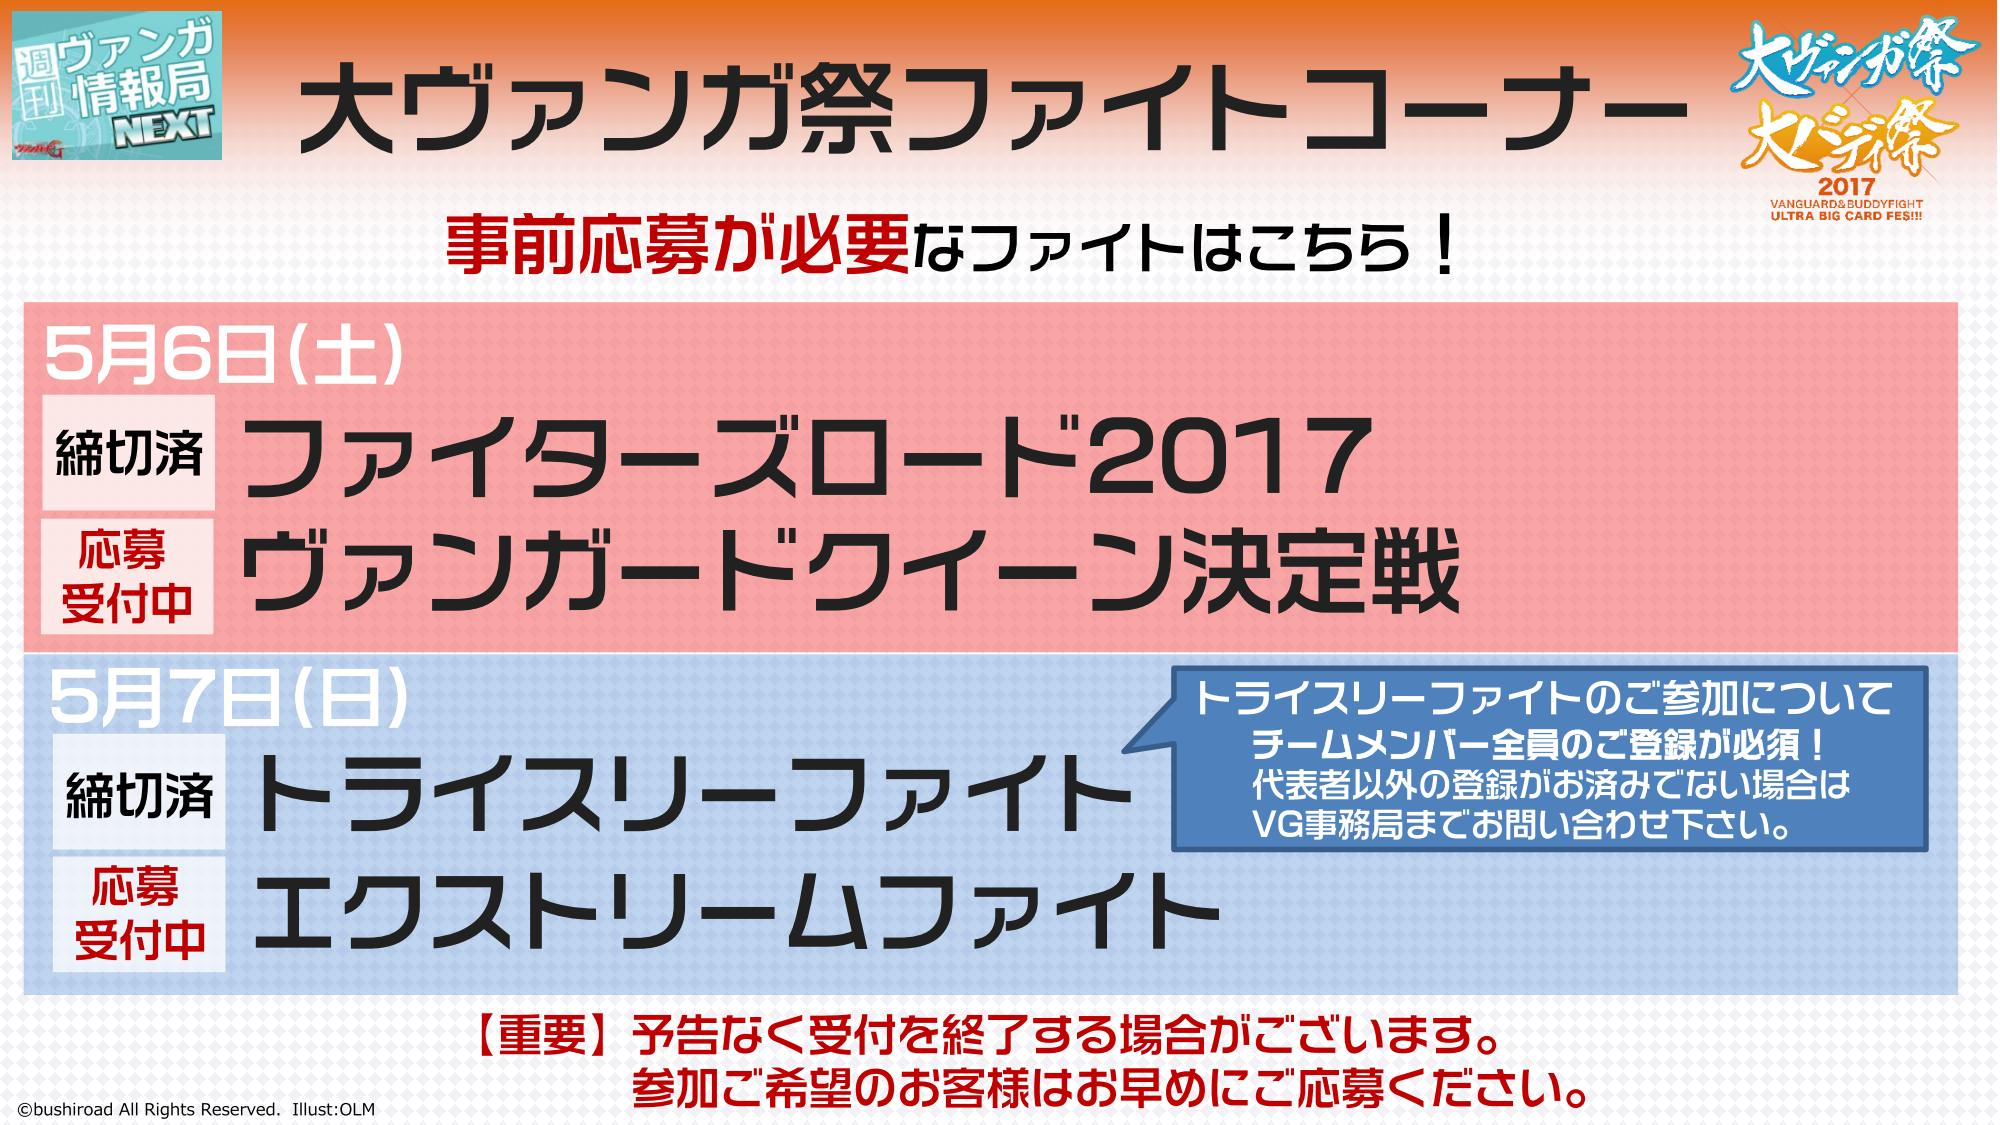 vg-live-20170502-001.jpg